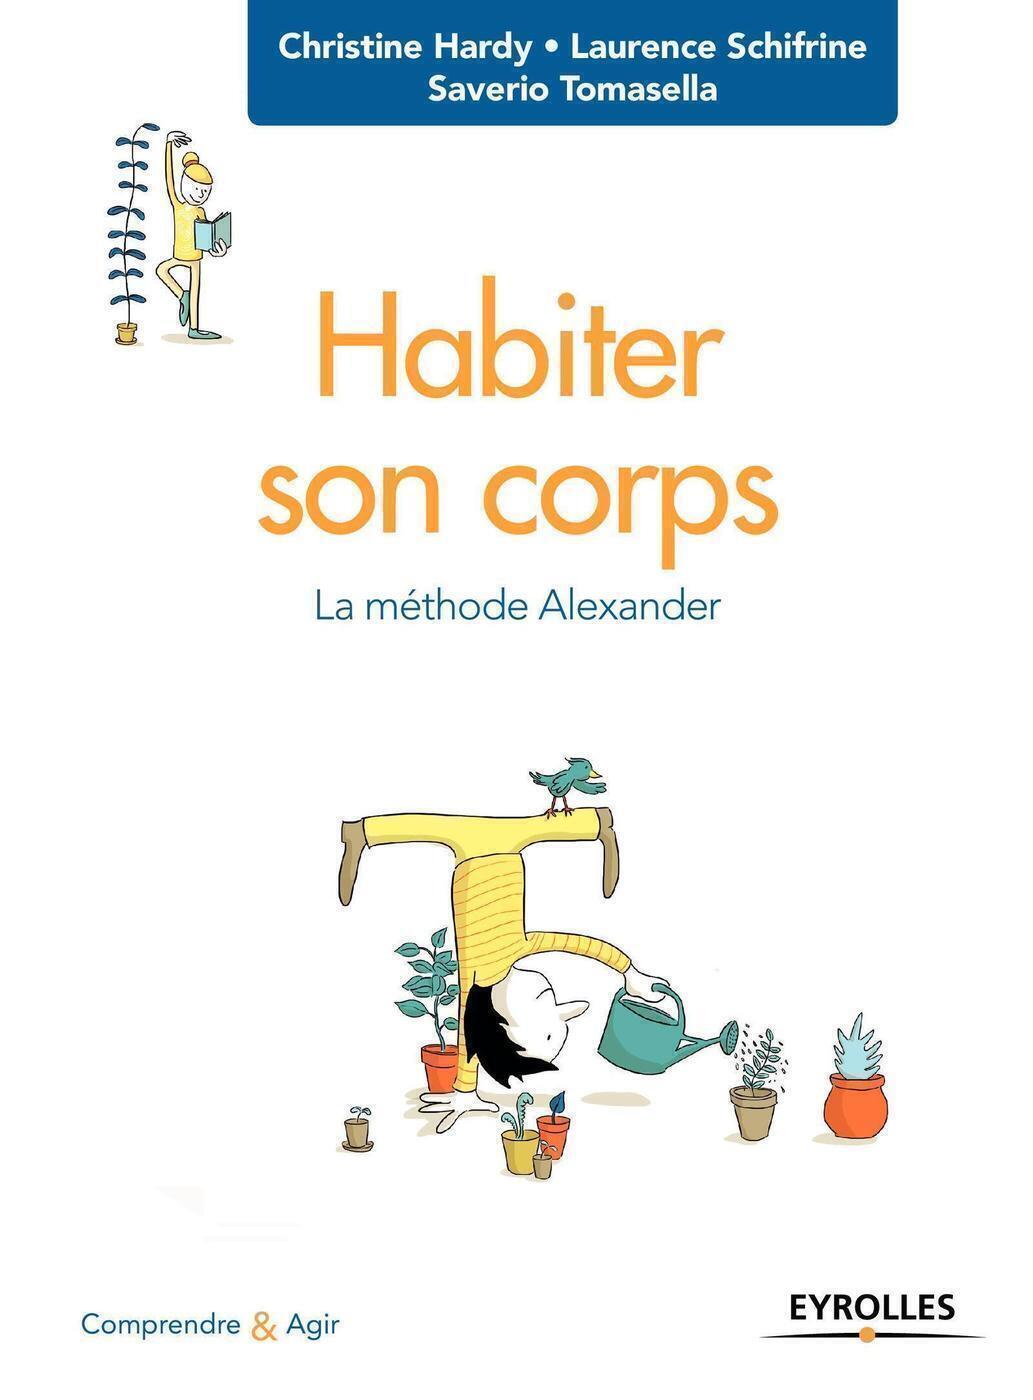 HABITER SON CORPS